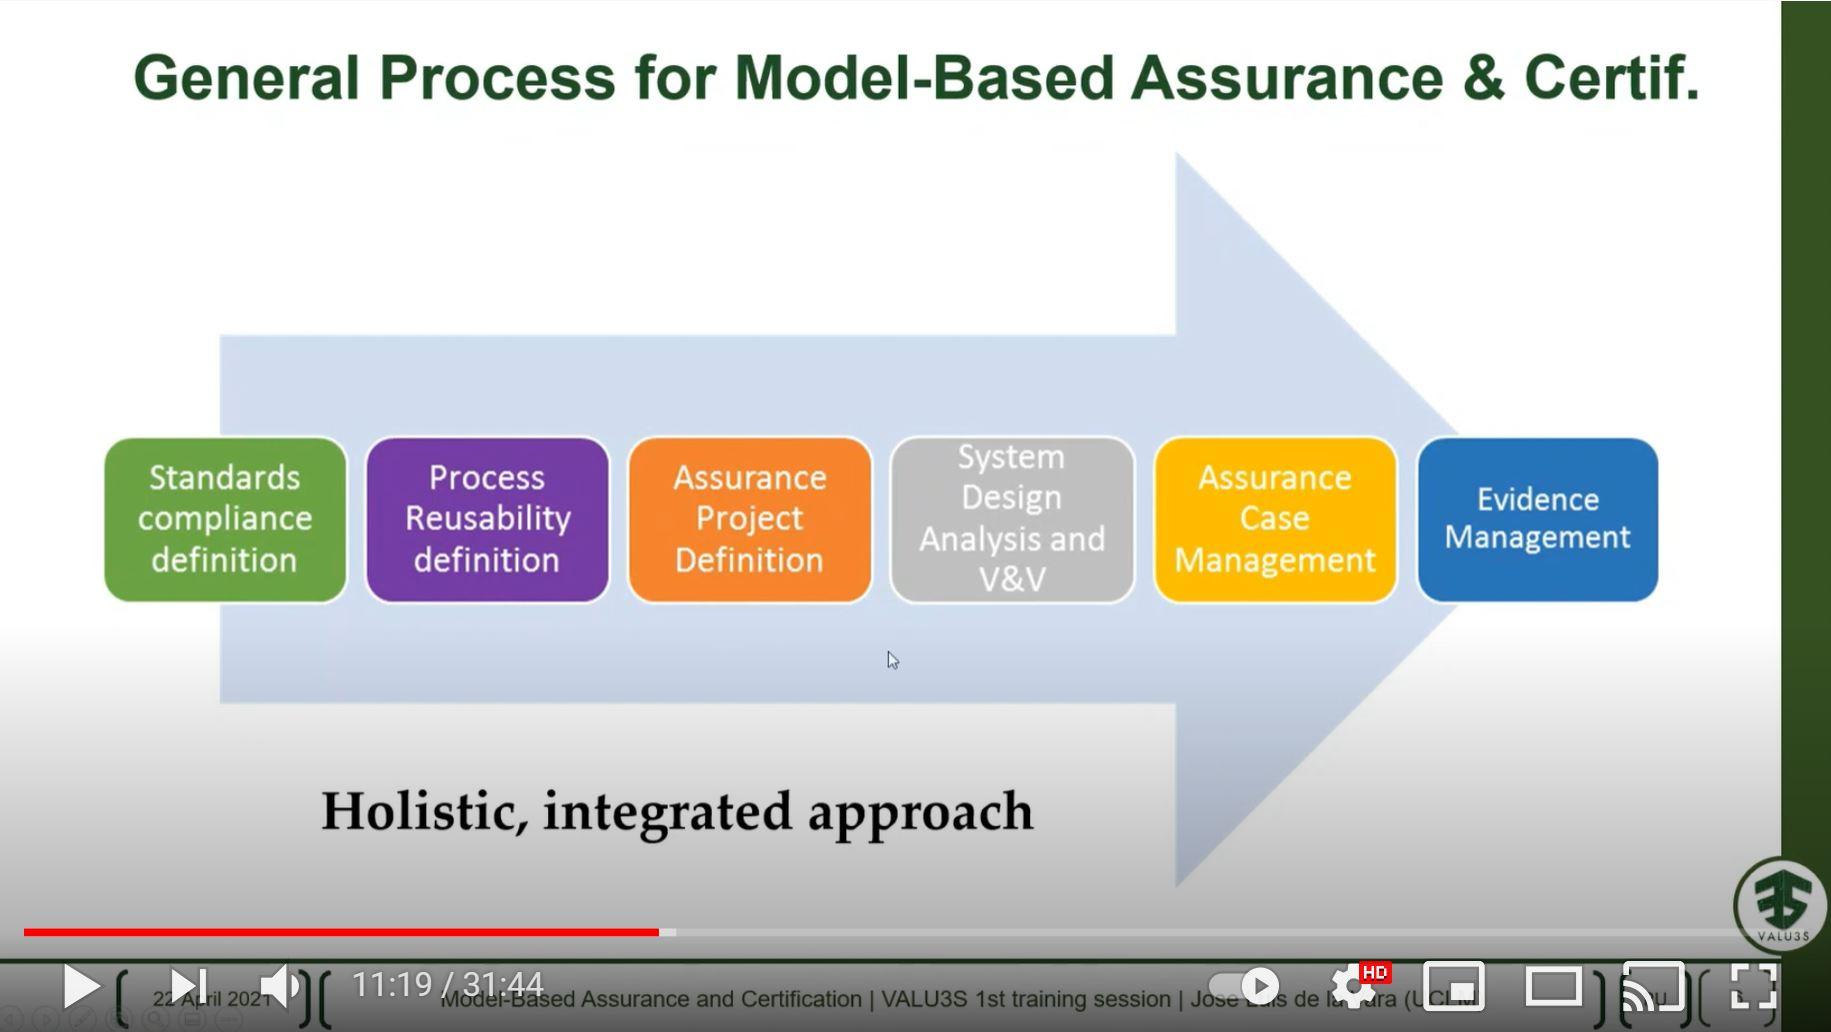 16846 Model Based Assurance and Certification